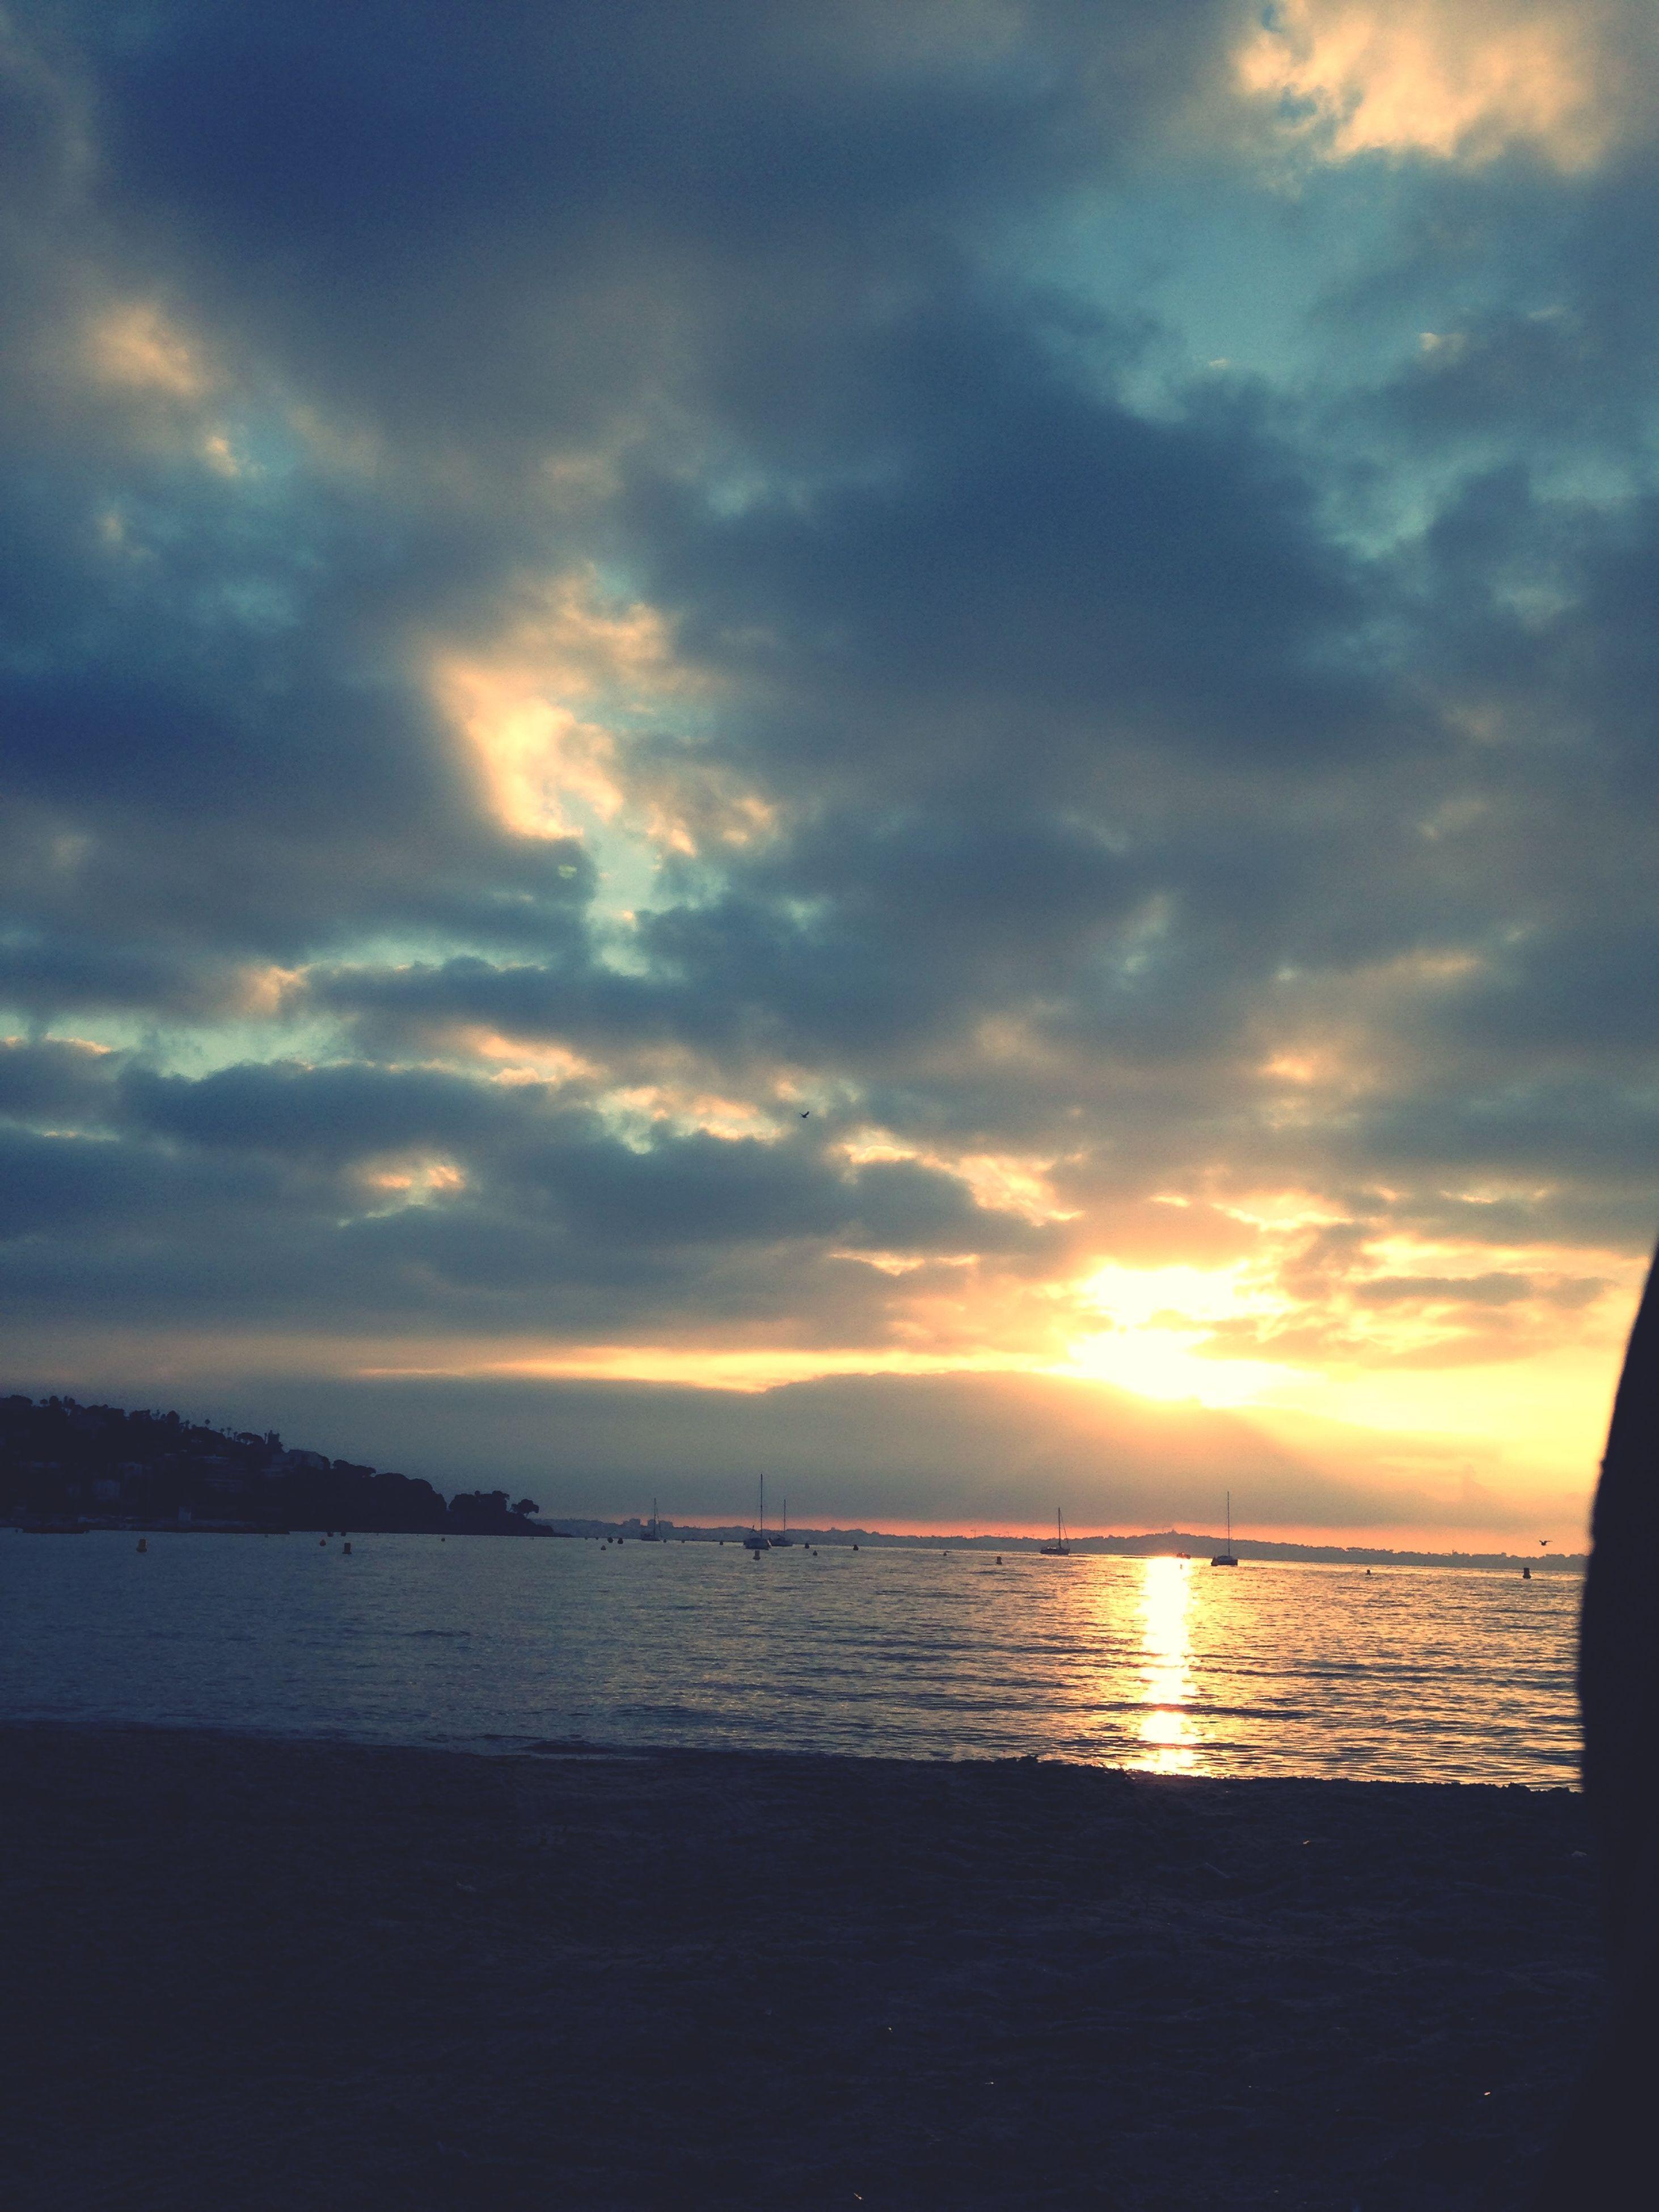 sunset, sea, water, horizon over water, sky, scenics, tranquil scene, tranquility, beauty in nature, cloud - sky, beach, orange color, nature, idyllic, sun, cloud, silhouette, shore, sunlight, reflection